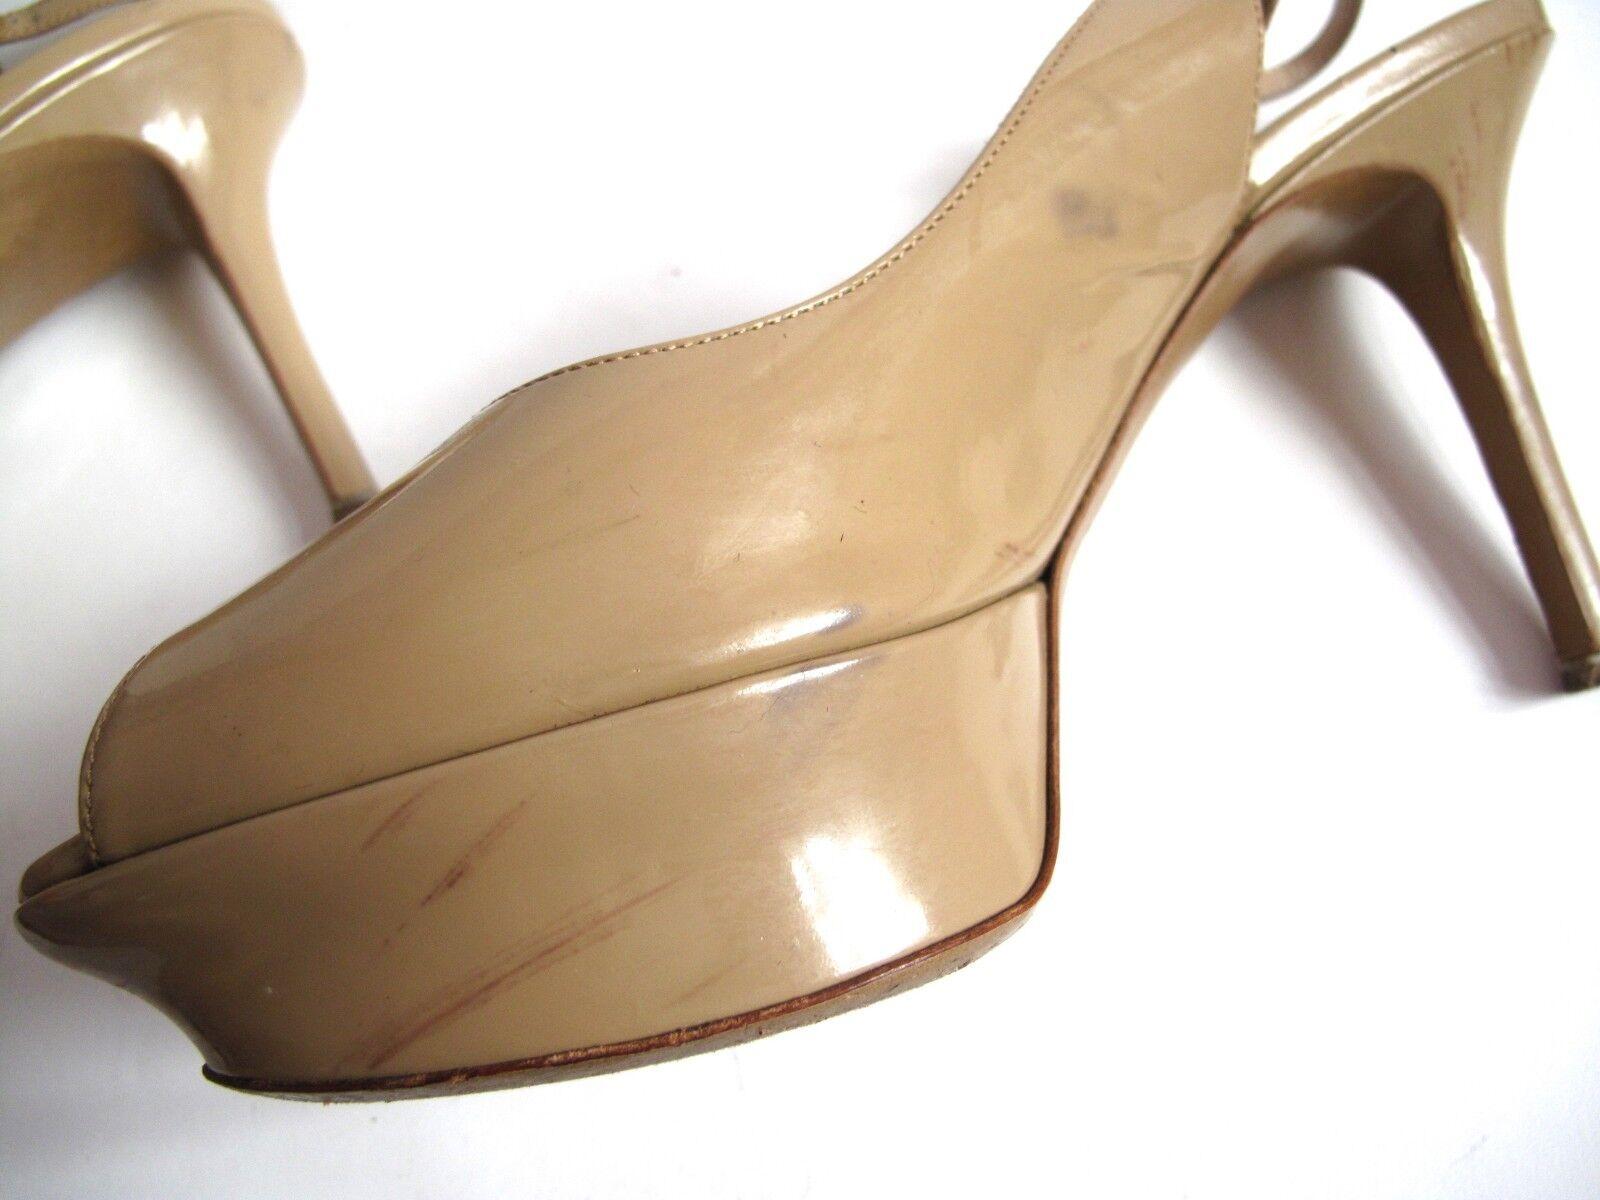 Nicholas Kirkwood Nude platform slingback heels UK 6 6 UK - EU39 - US8.5 ffaf4d